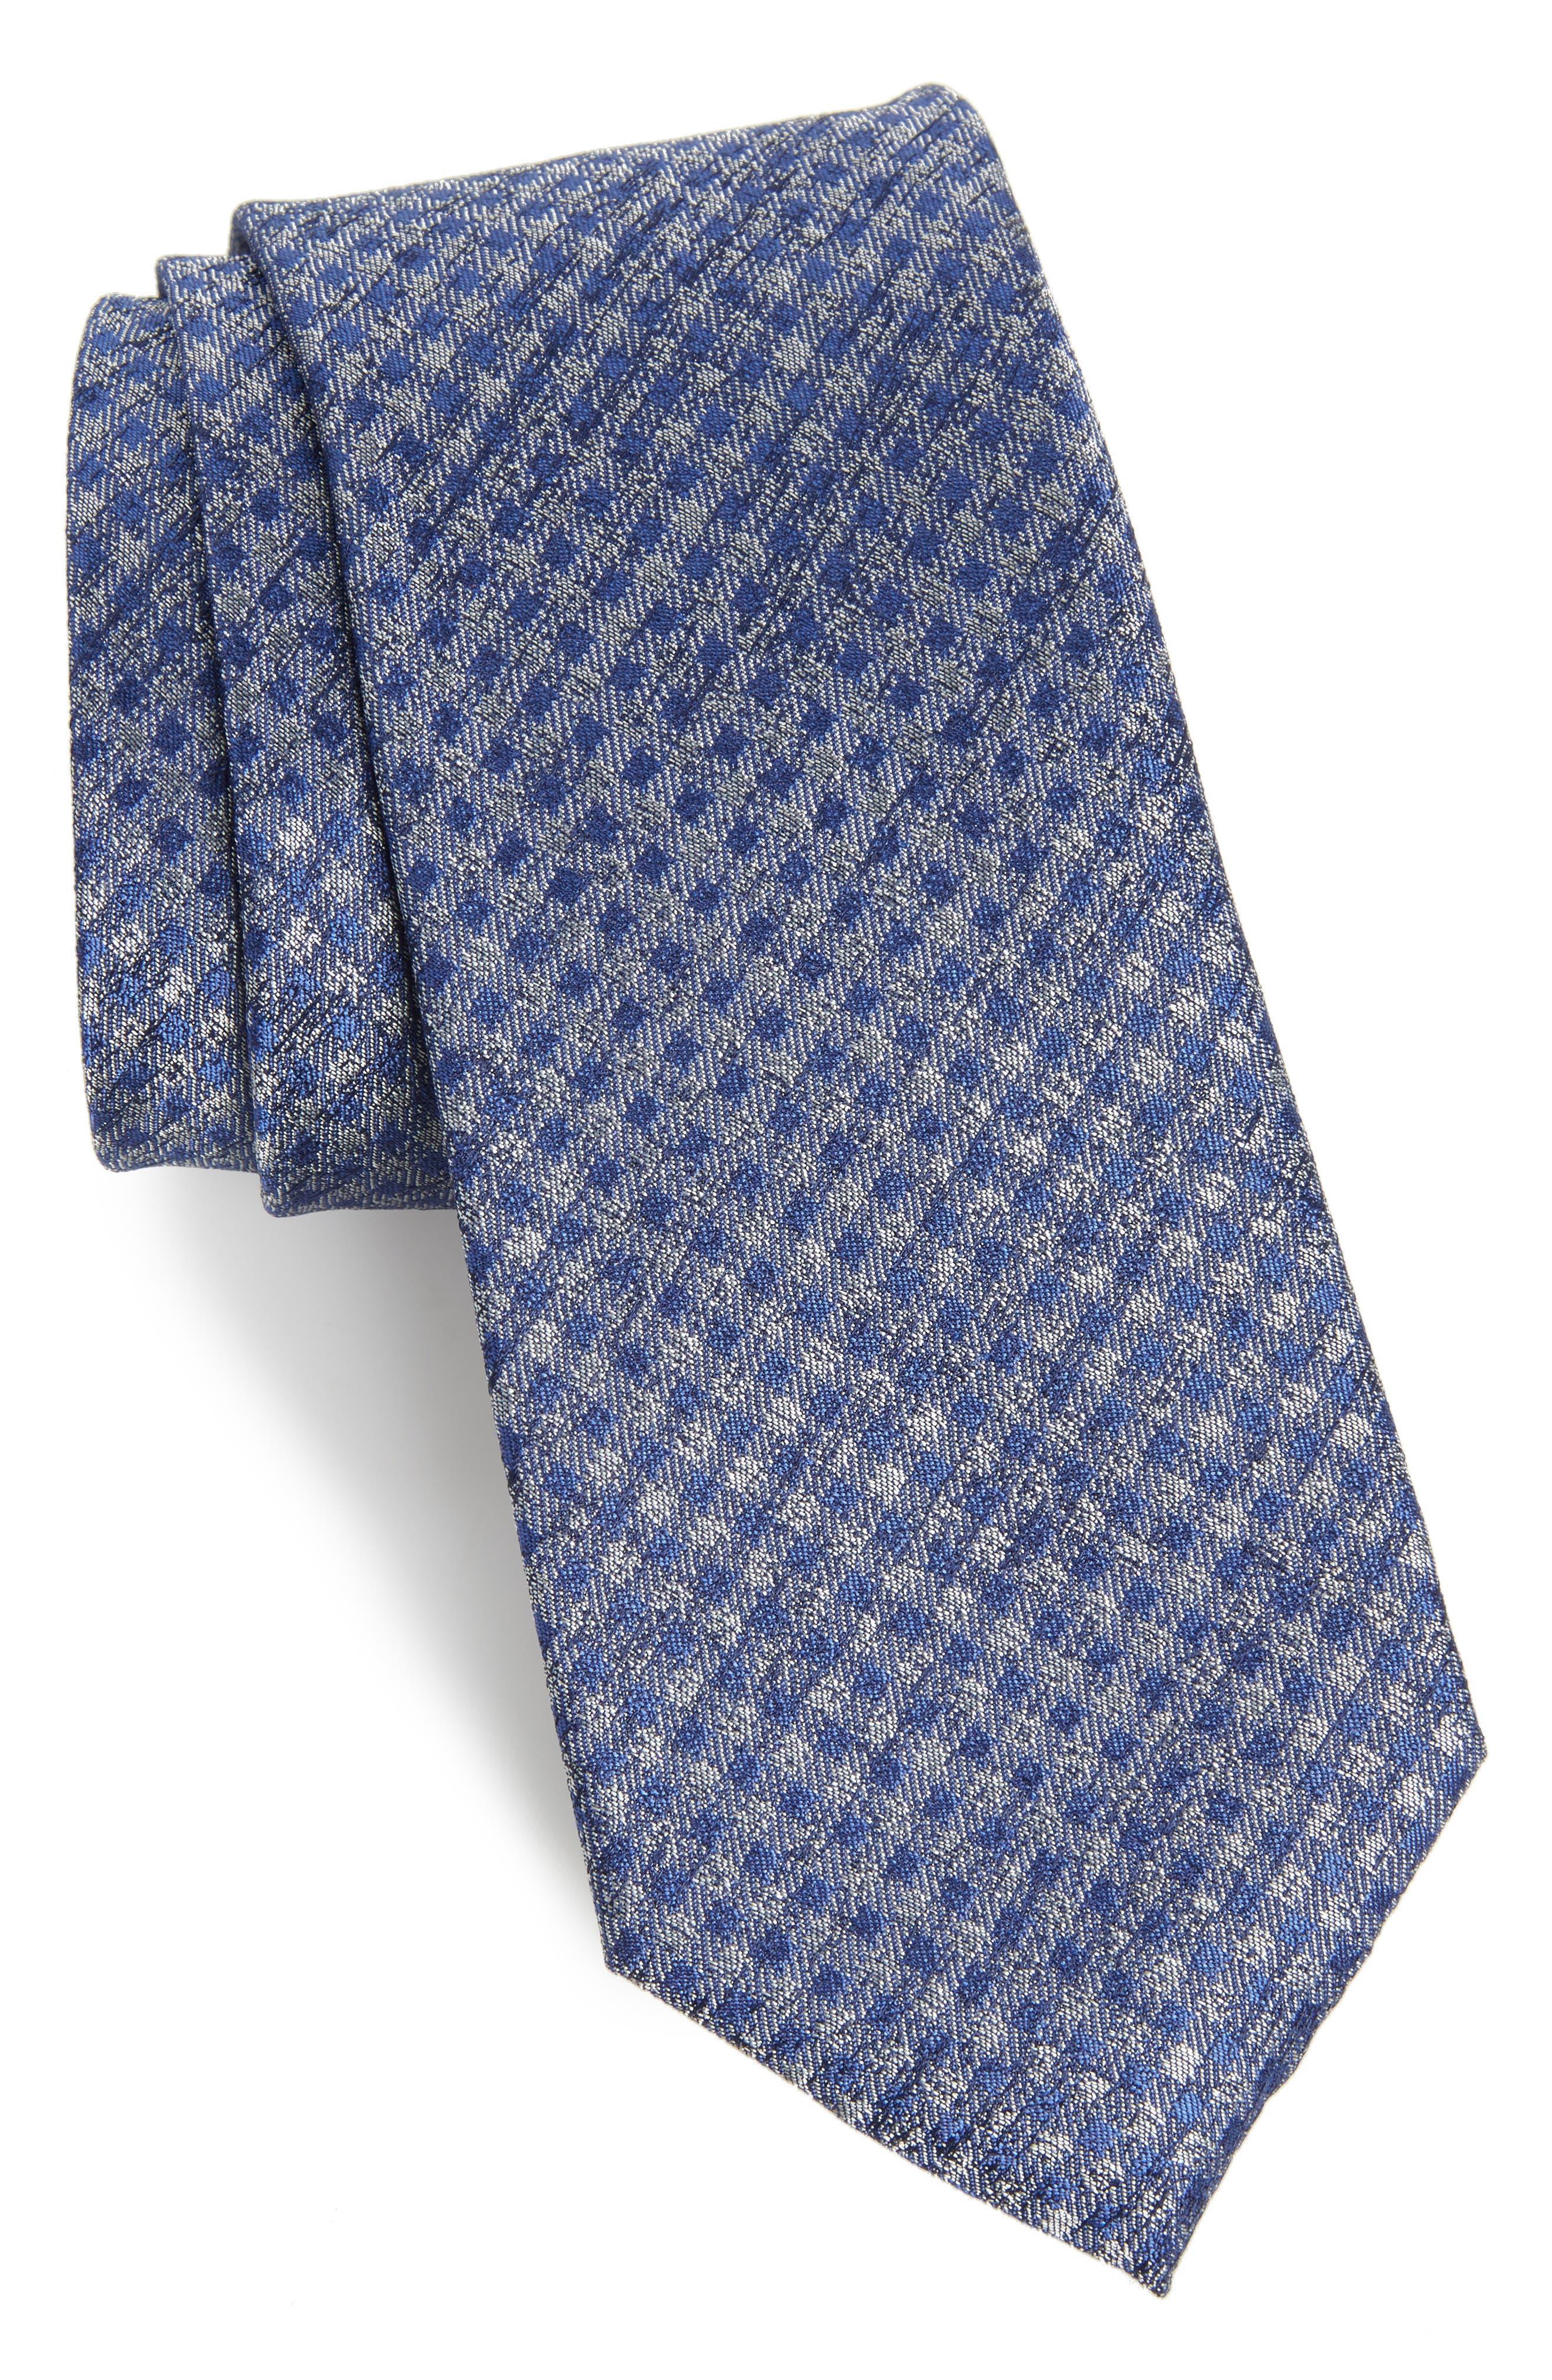 Alternate Image 1 Selected - Calibrate Porter Check Silk Tie